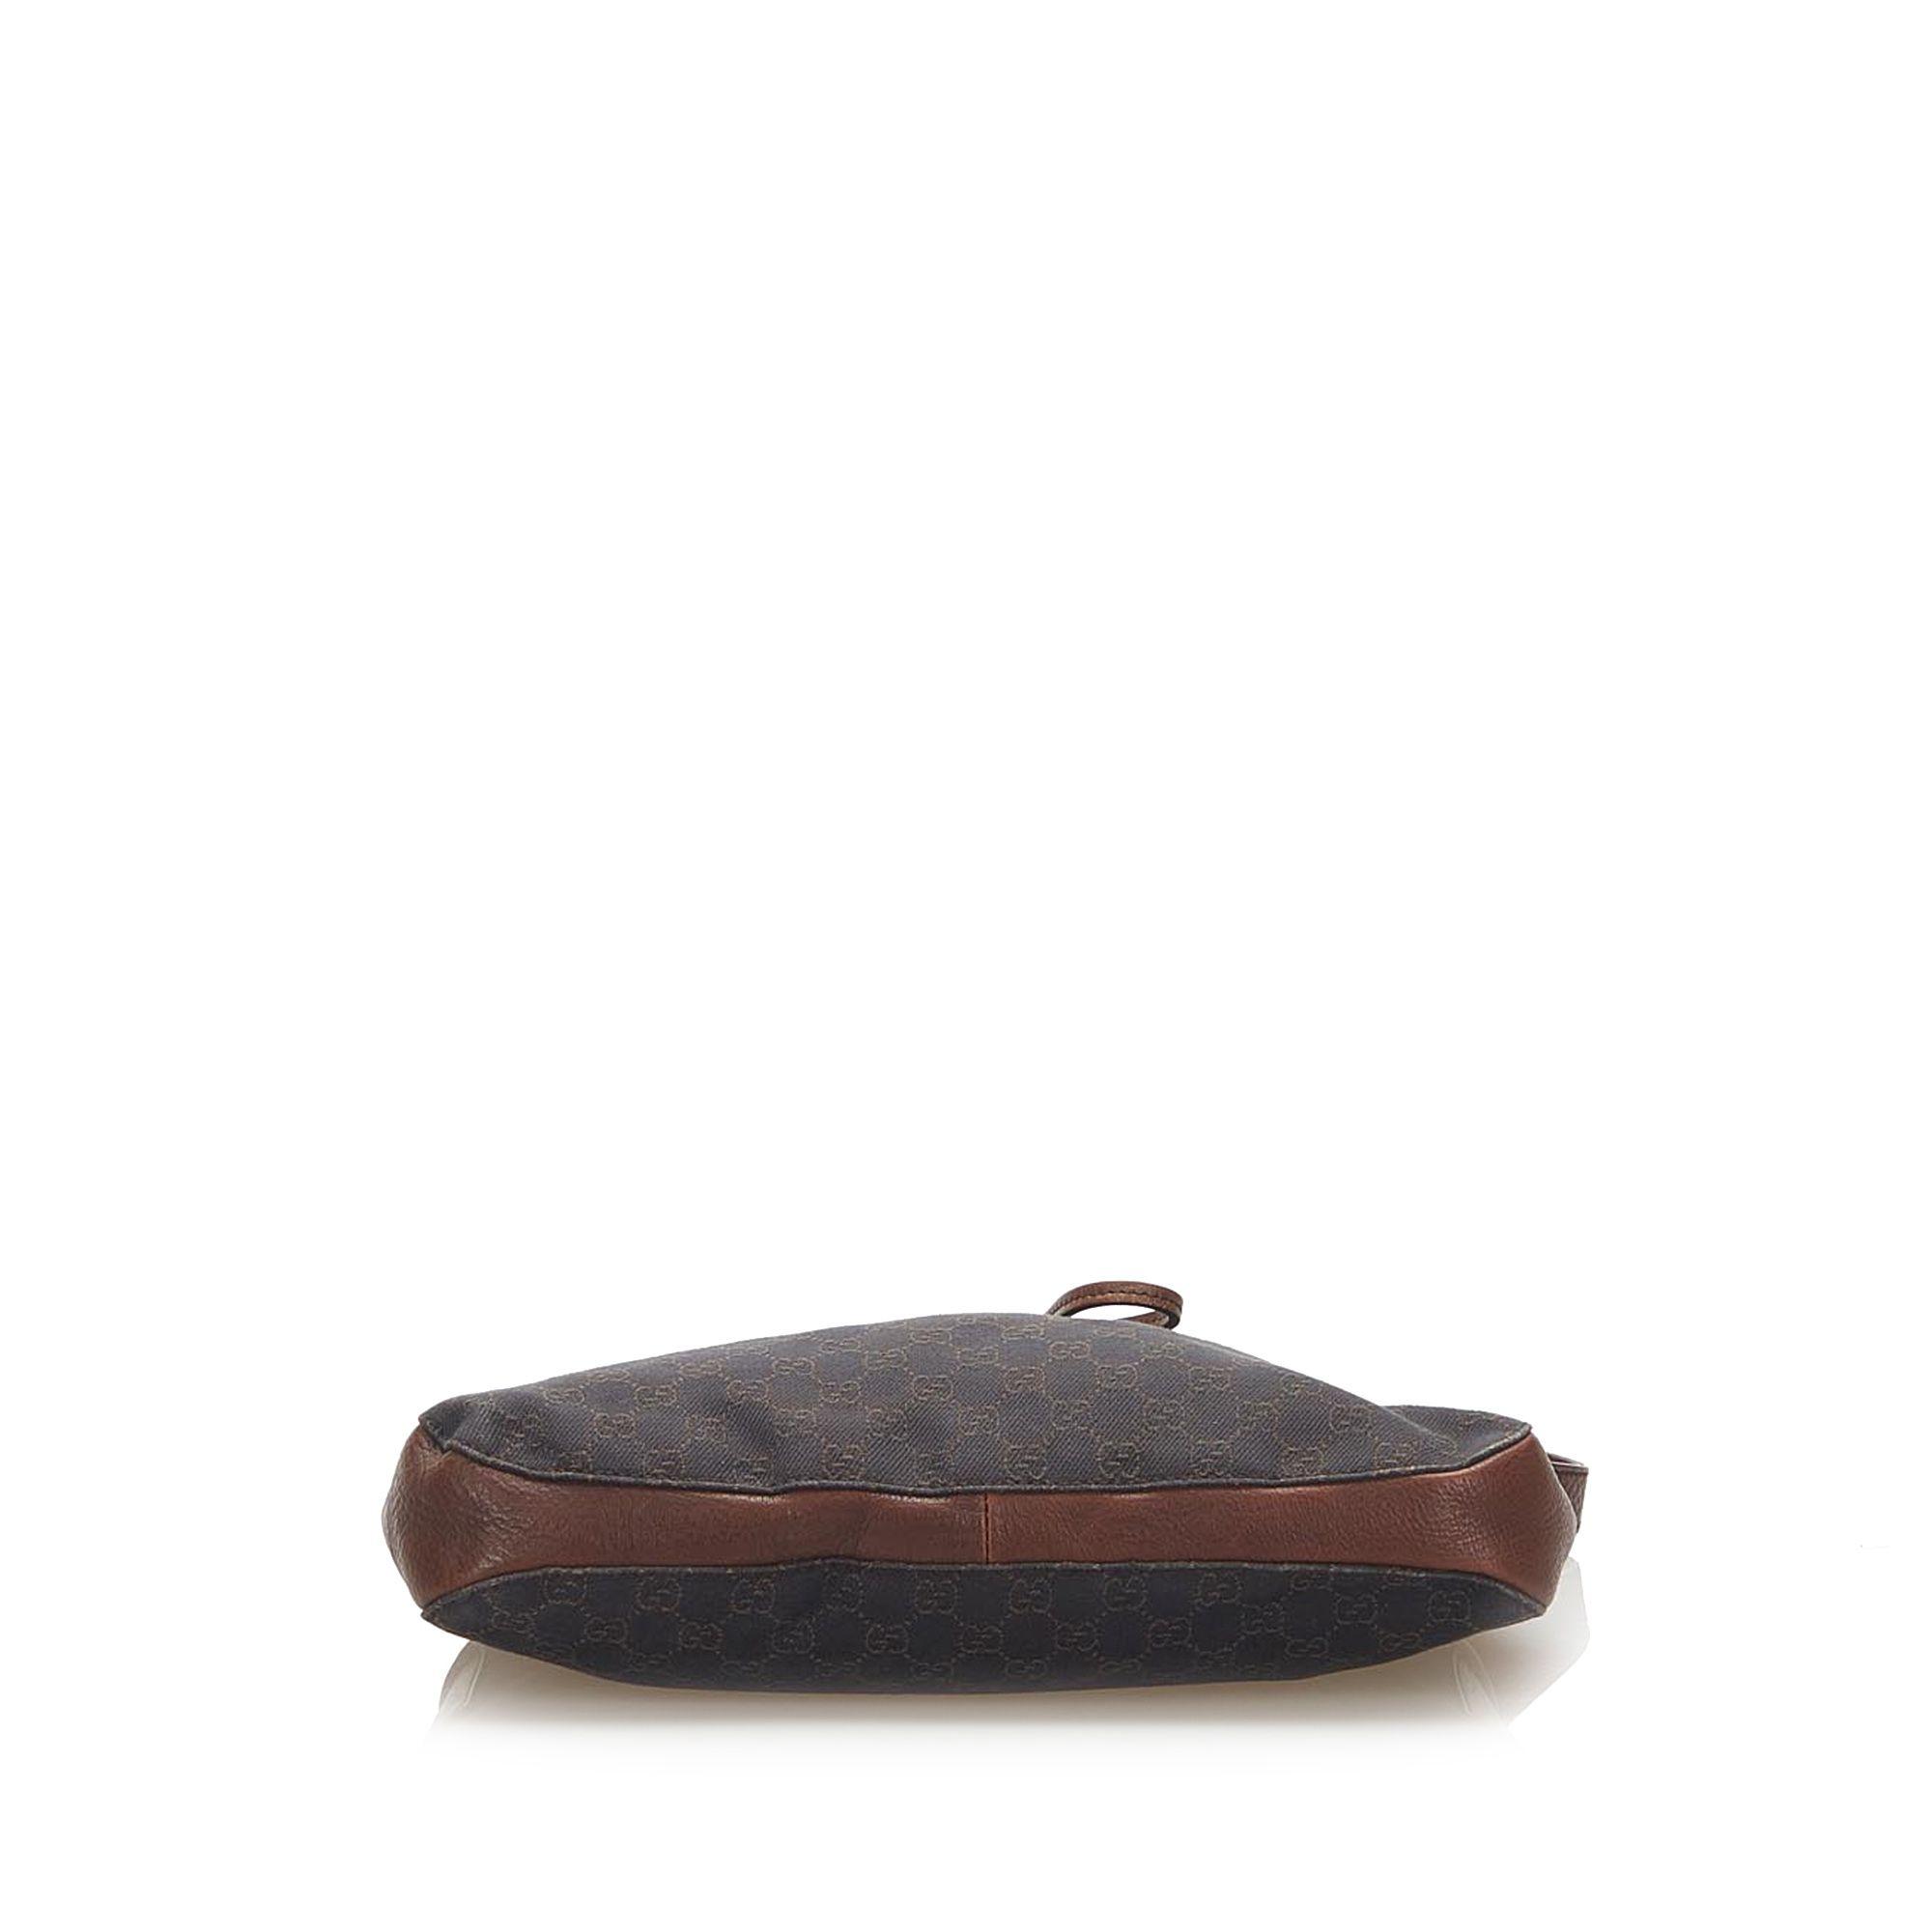 Vintage Gucci GG Canvas Horsebit Shoulder Bag Black